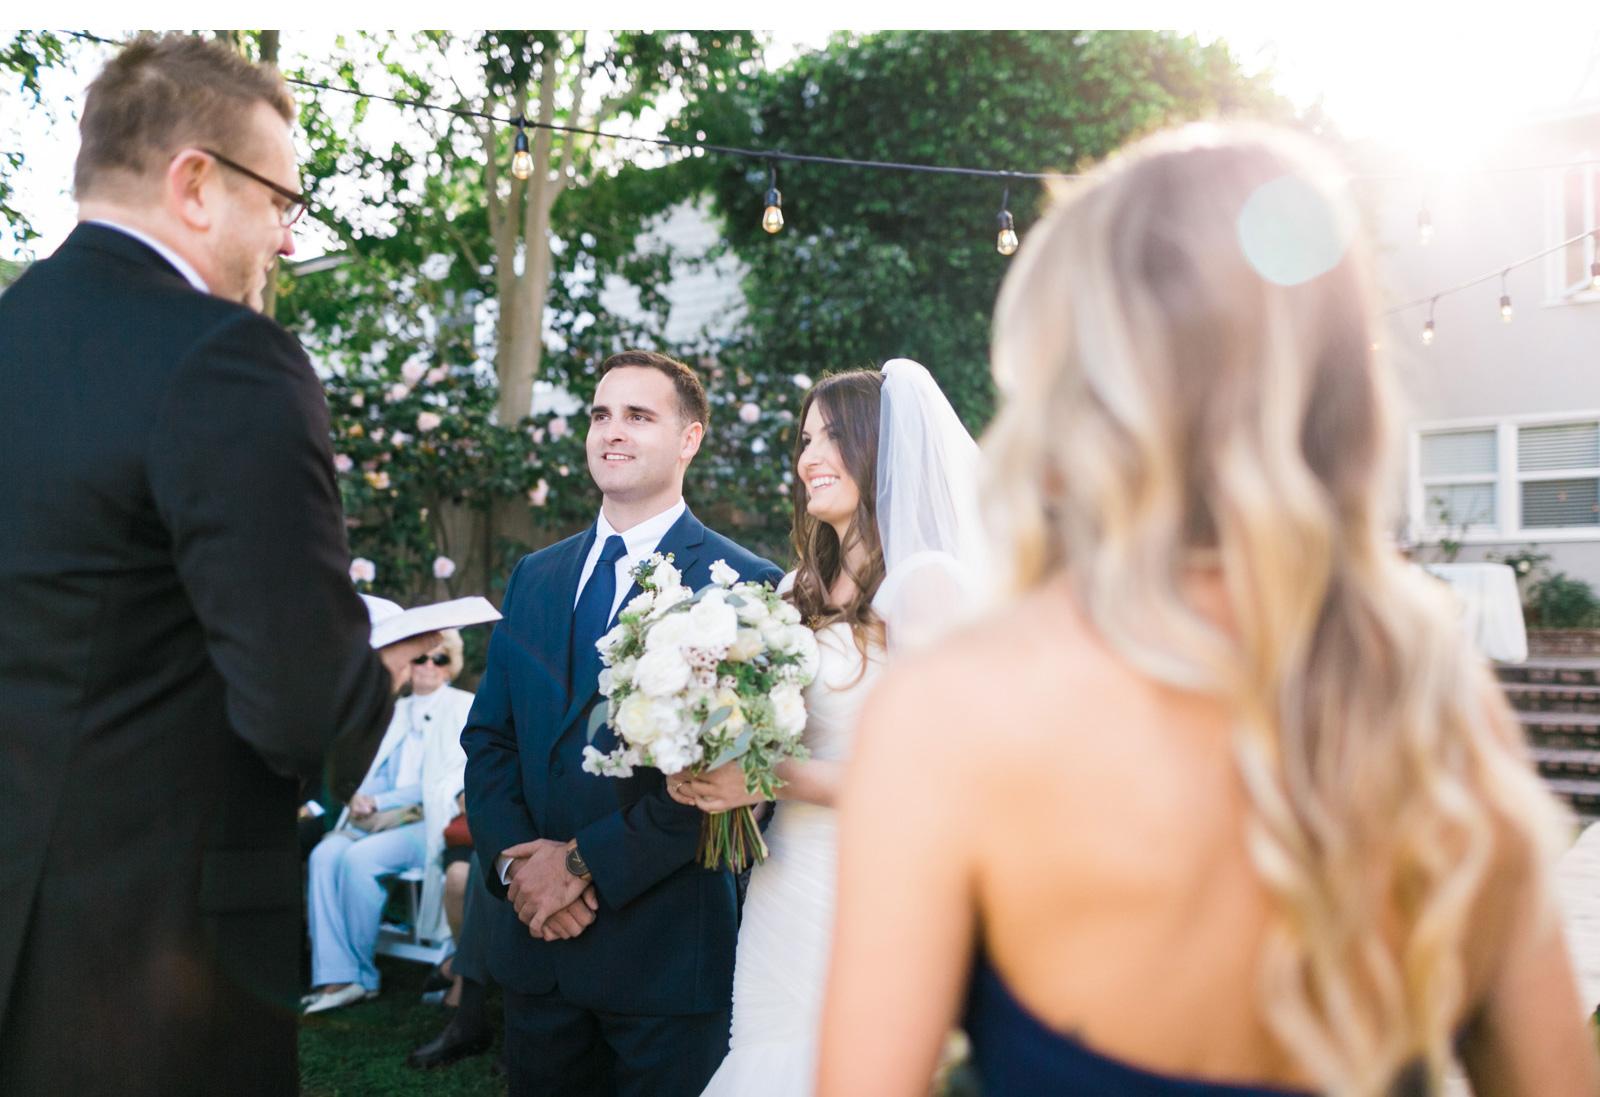 Jon-&-Amanda-Dougher's-Backyard-Wedding-Natalie-Schutt-Photography_06.jpg